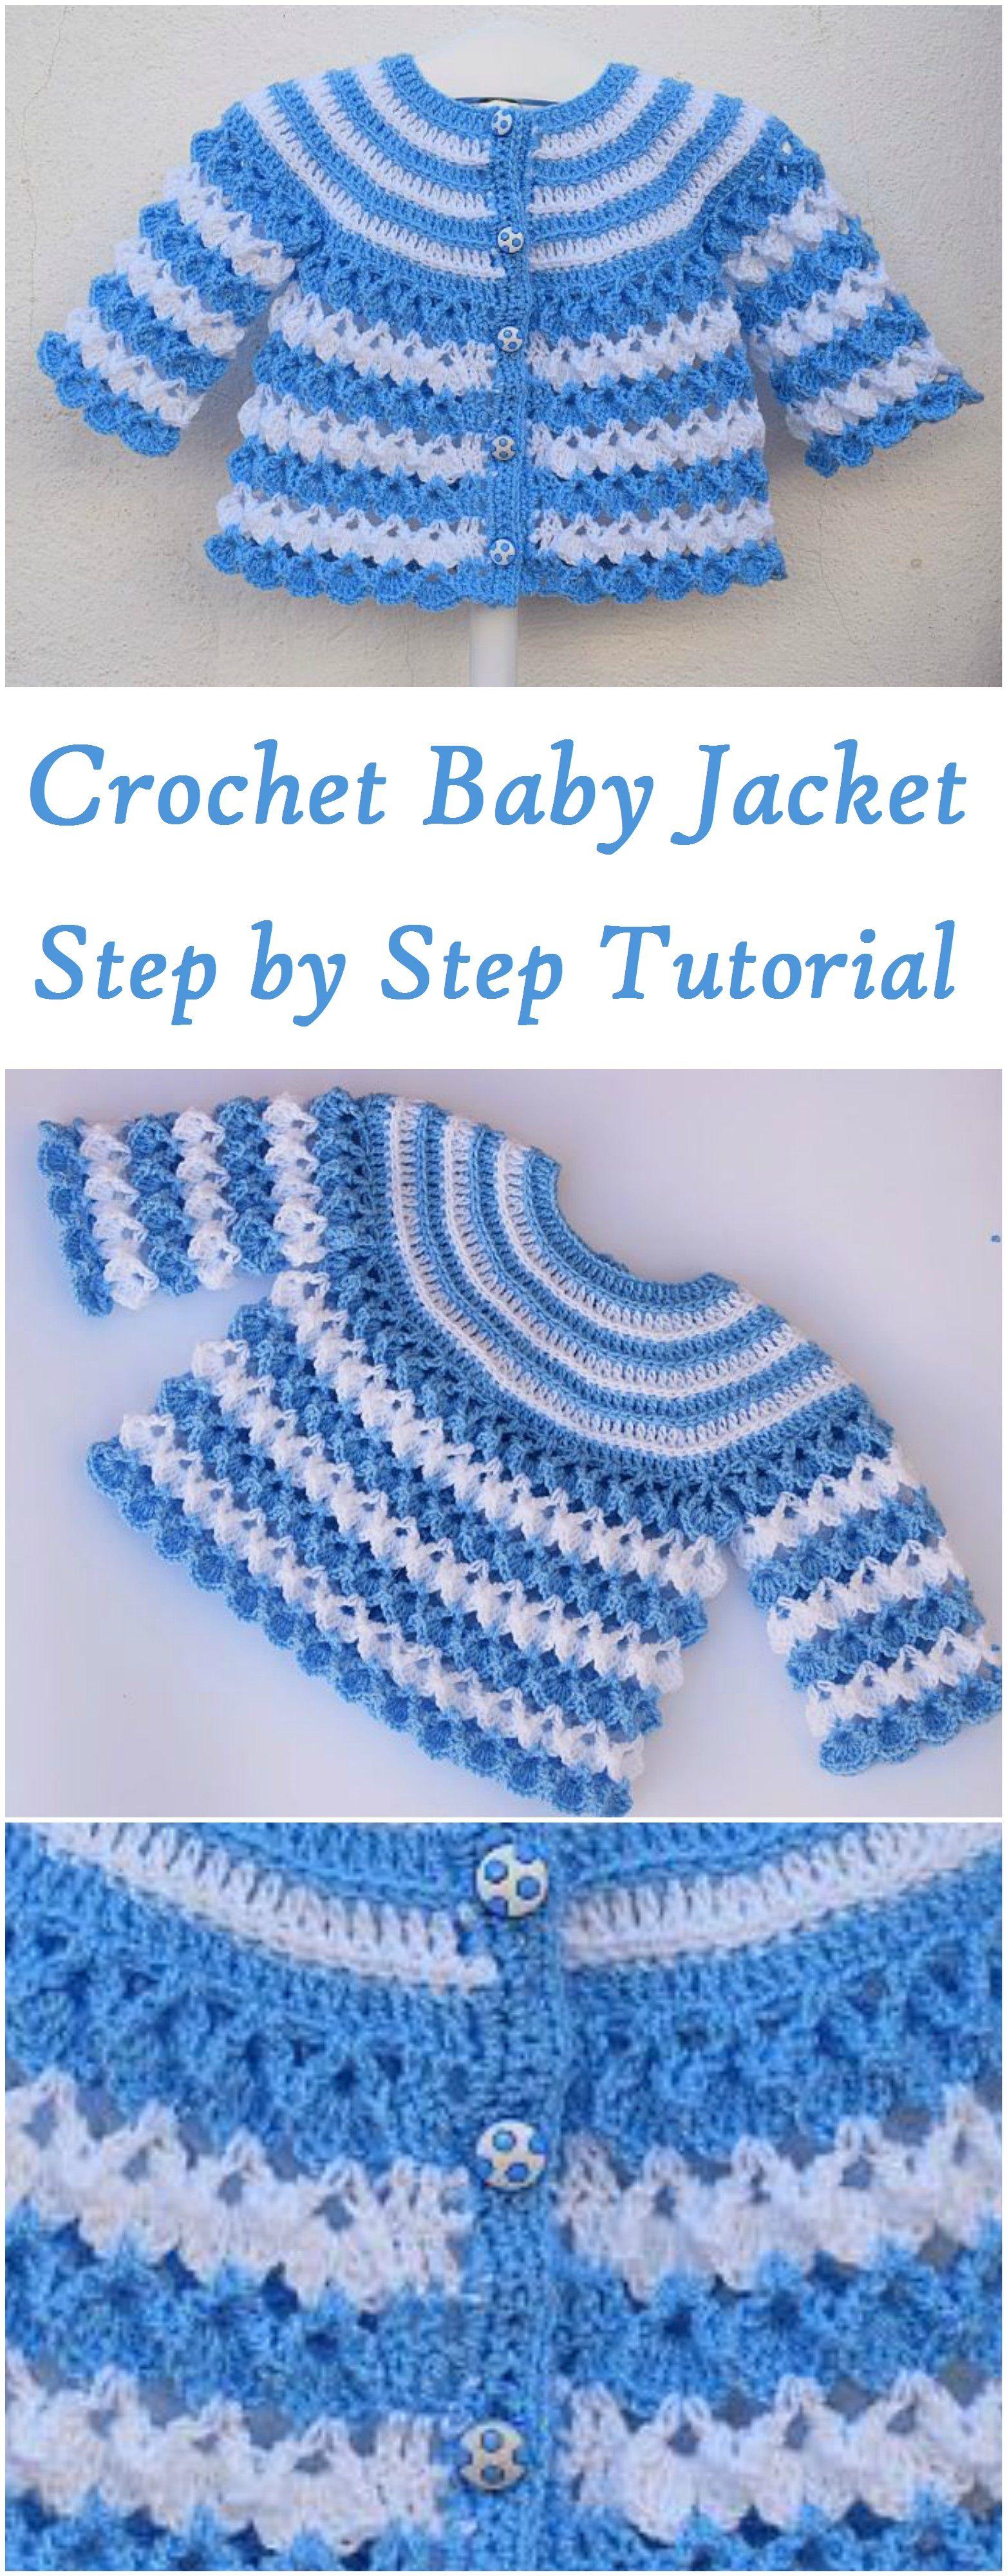 Baby Jacket Crochet Jearsy | ally | Pinterest | Häkeln, Baby jacke ...